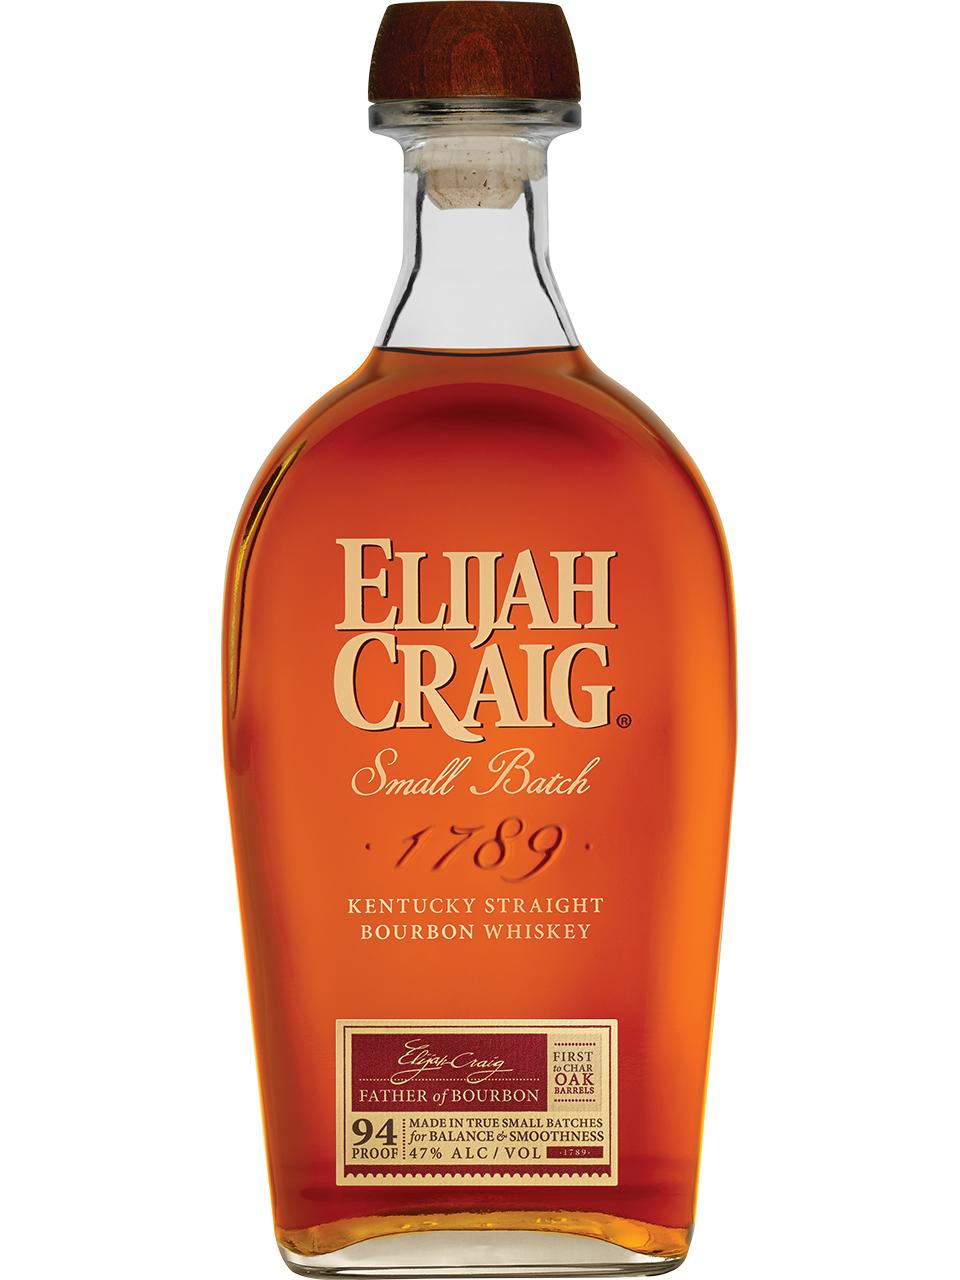 Elijah Craig Kentucky Straight Bourbon Whiskey